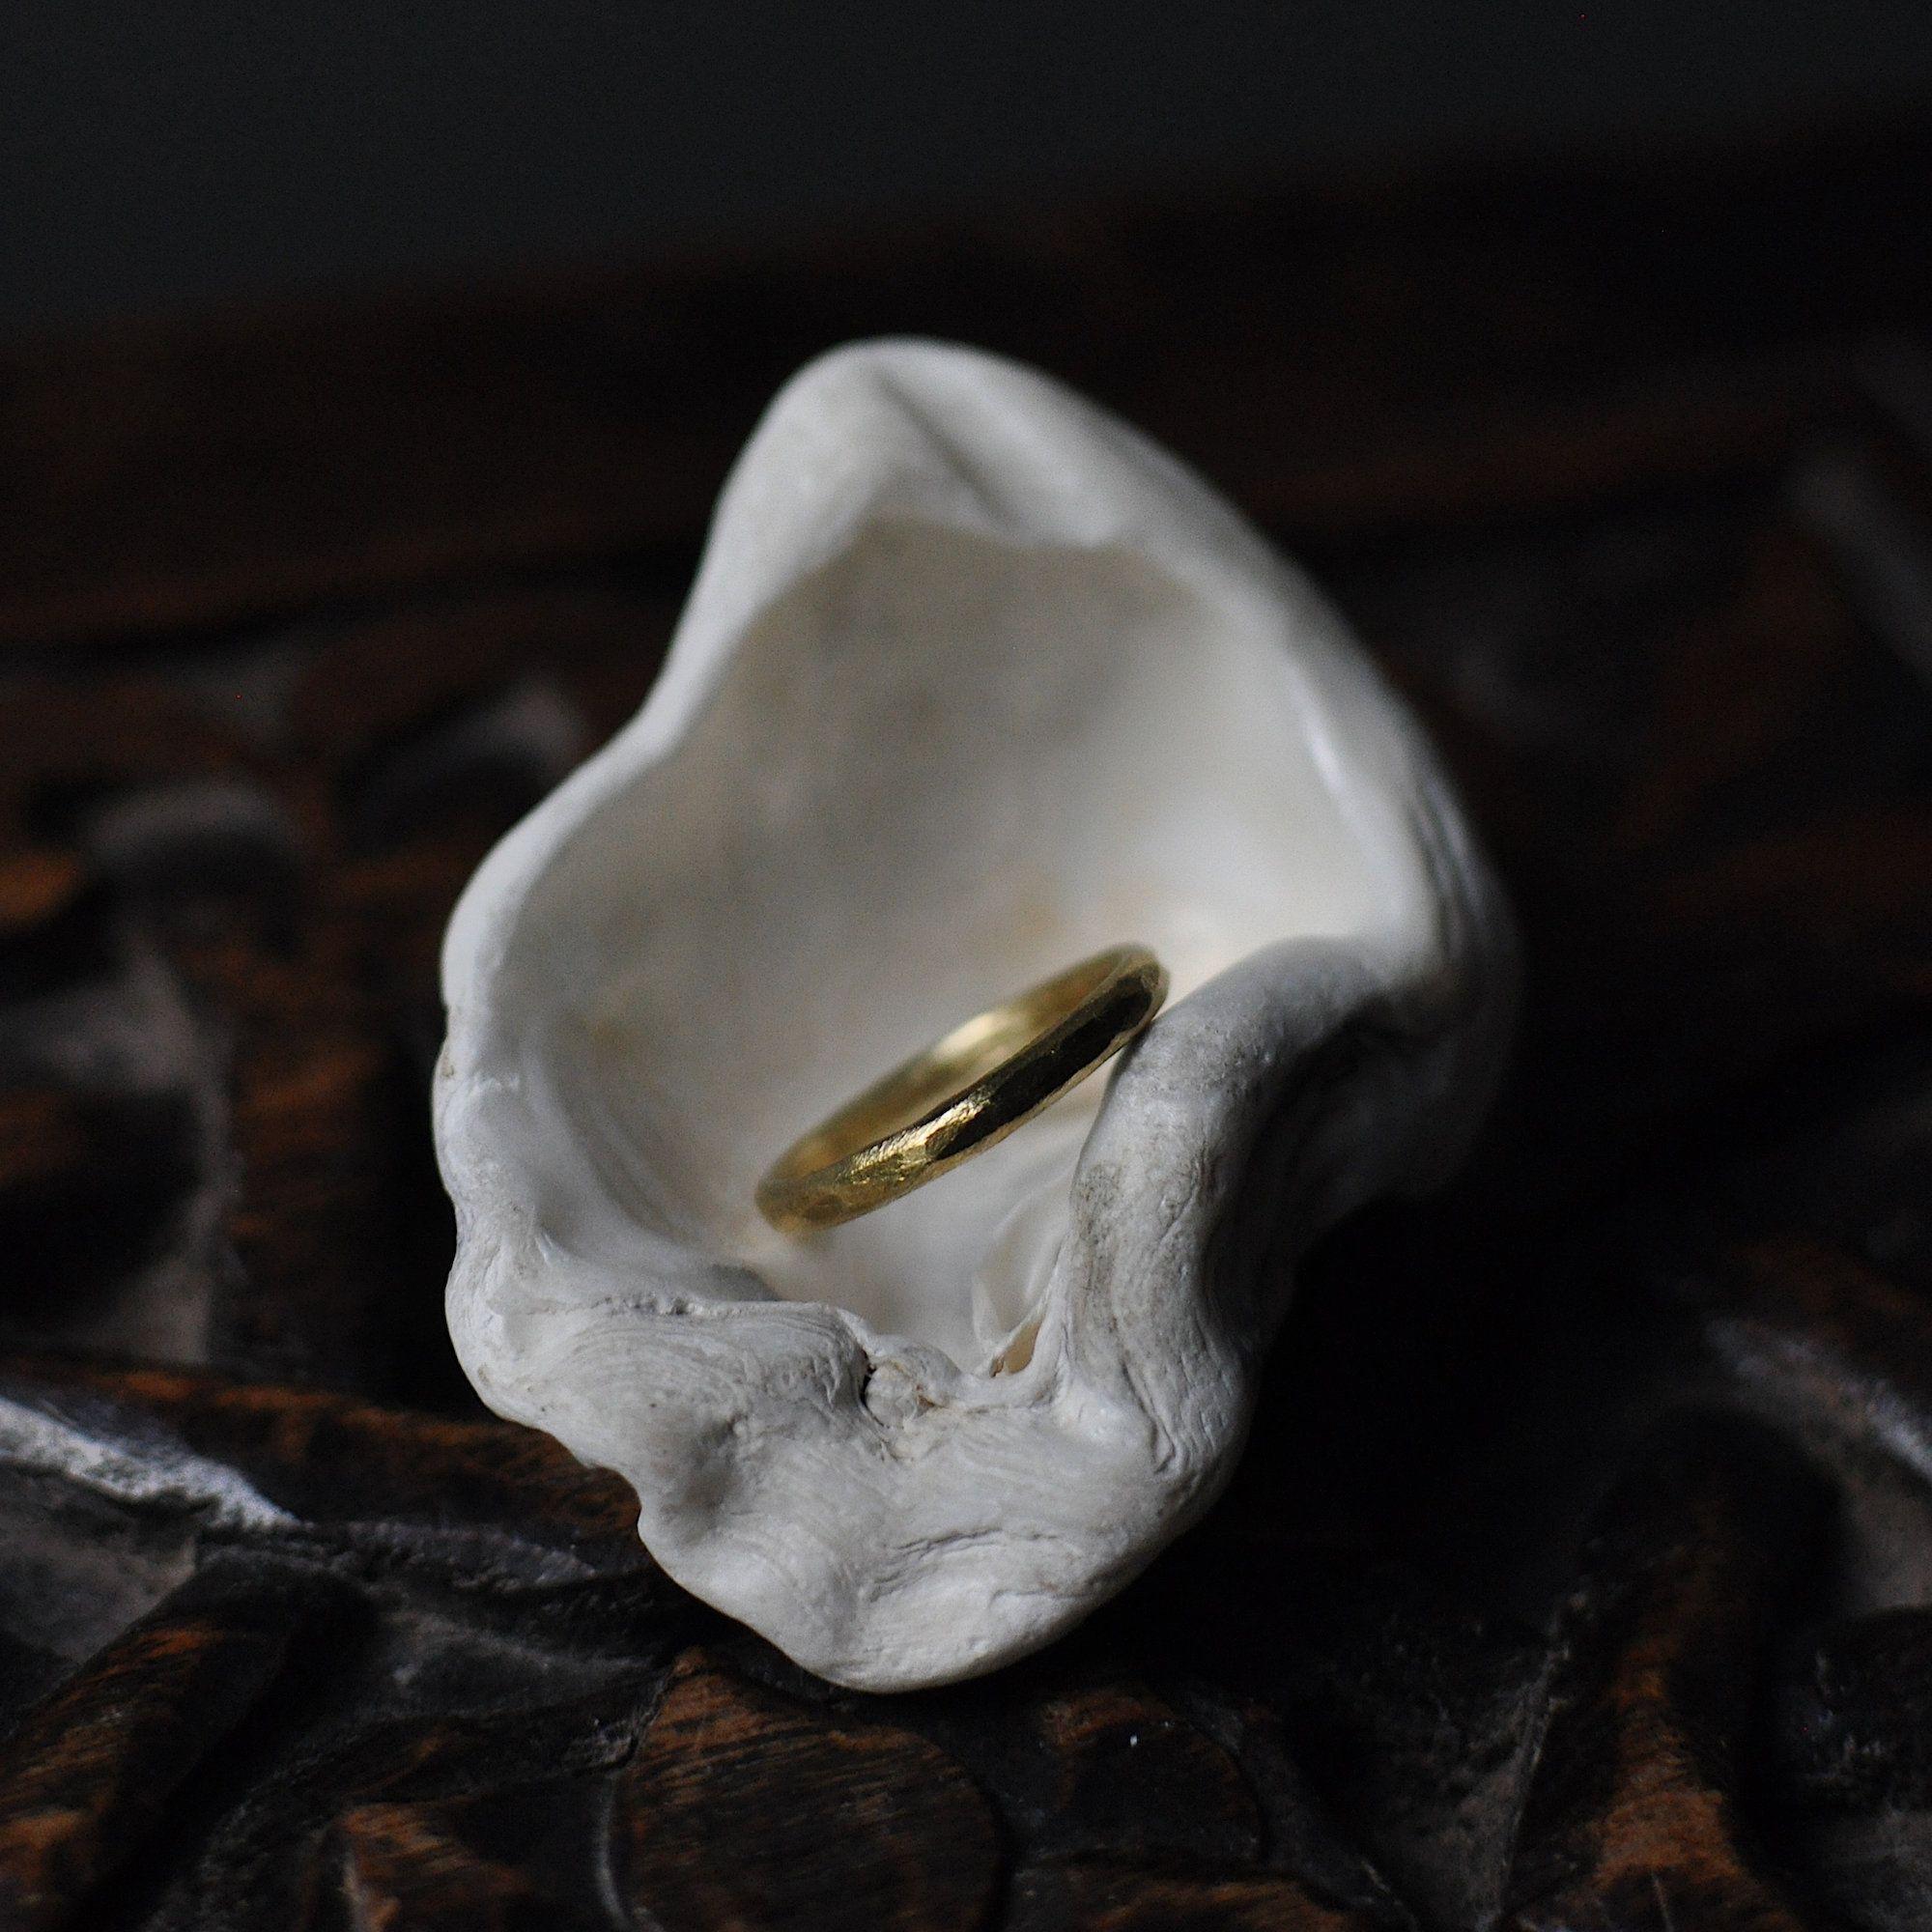 18ct yellow gold wedding ring gold wedding band thin